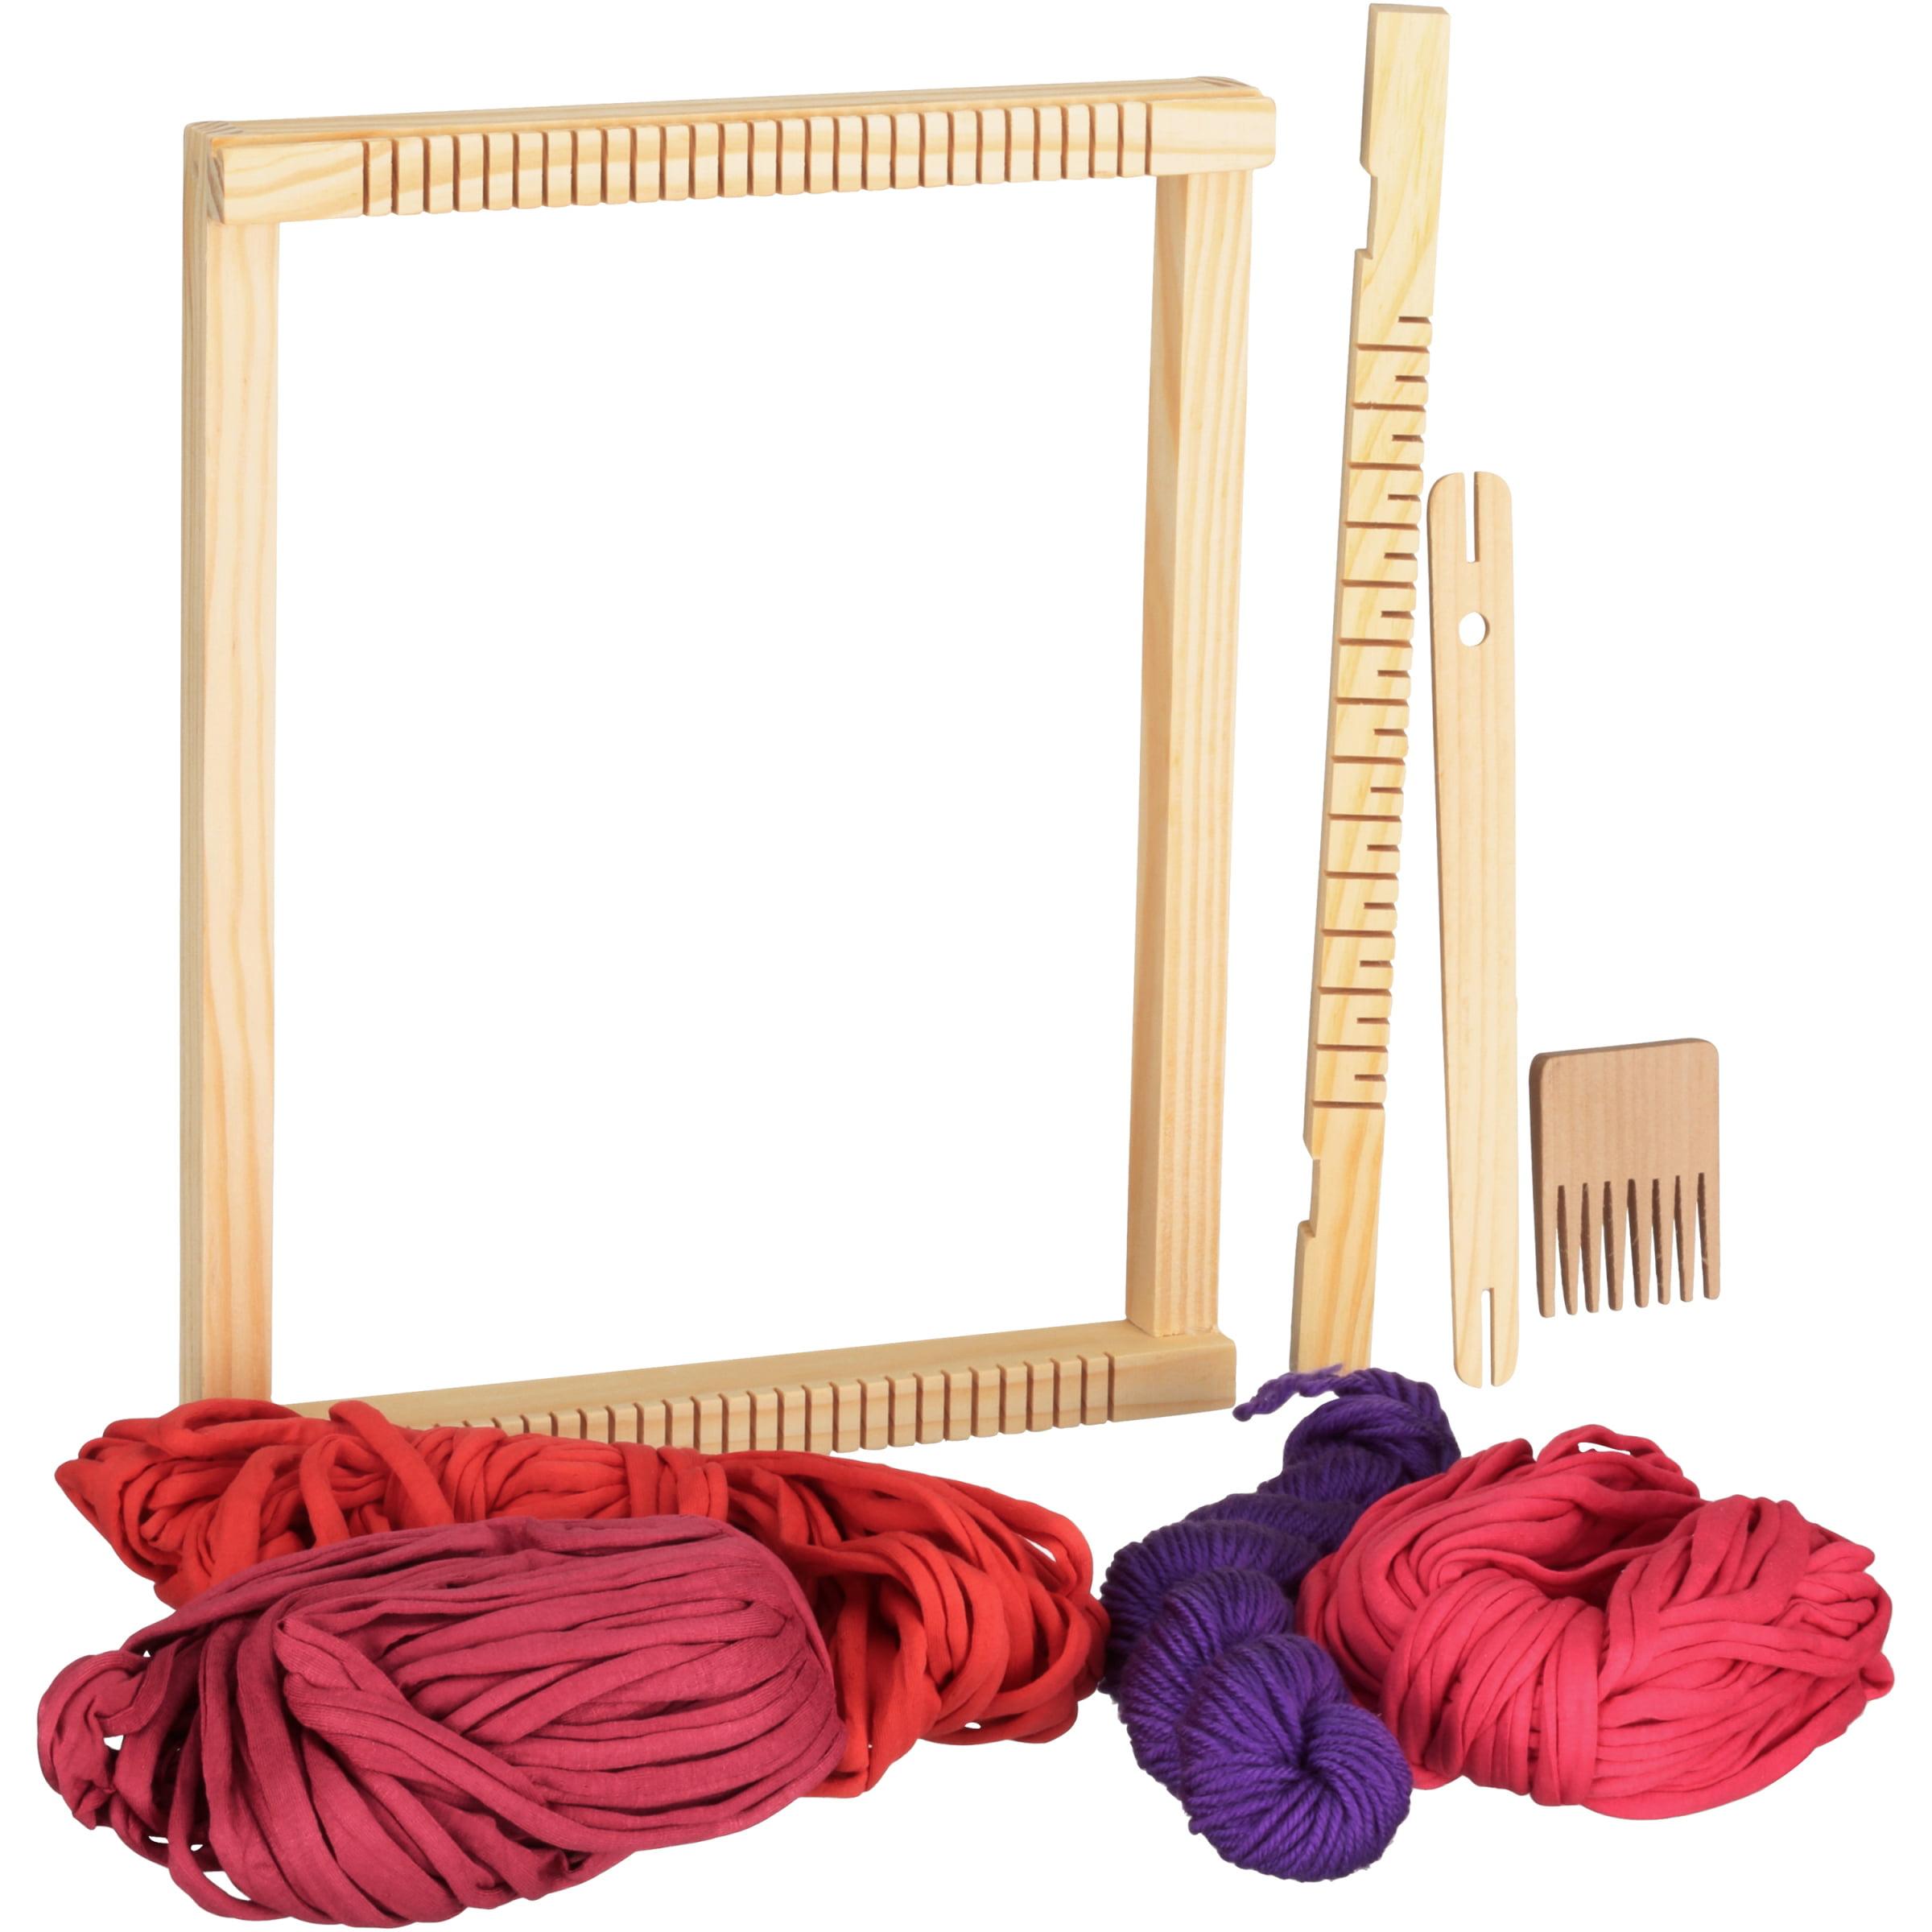 Small World® Weave-a-Bag™ Fashion Shoulder Bag Kit